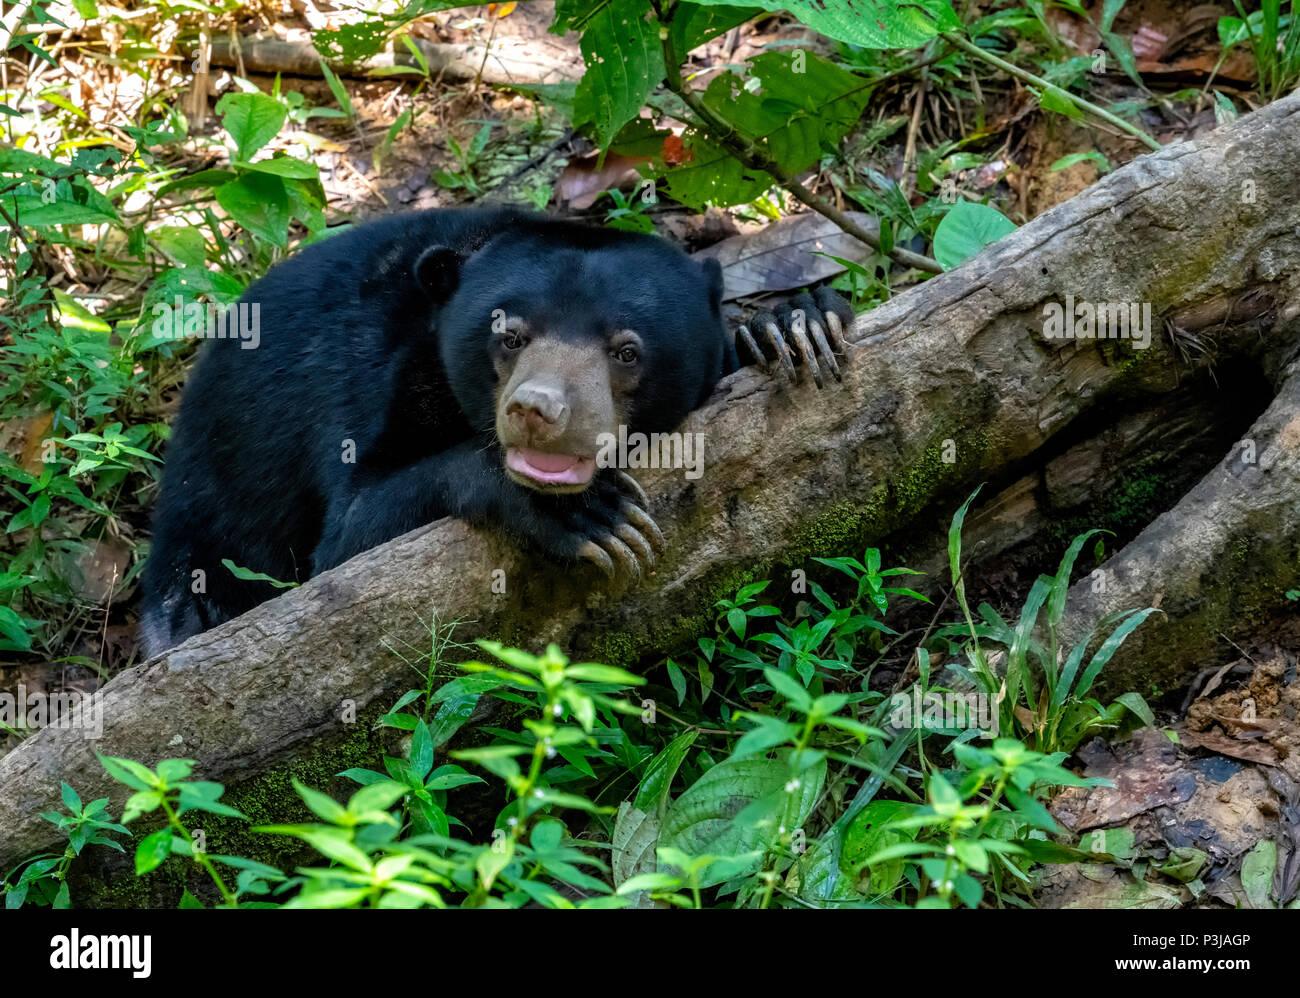 A Sun Bear (Helarctos malayanus) resting on a log in the rainforest at the Bornean Sun Bear Conservation Centre at Sepilok, Sandakan, Borneo, Malaysia - Stock Image